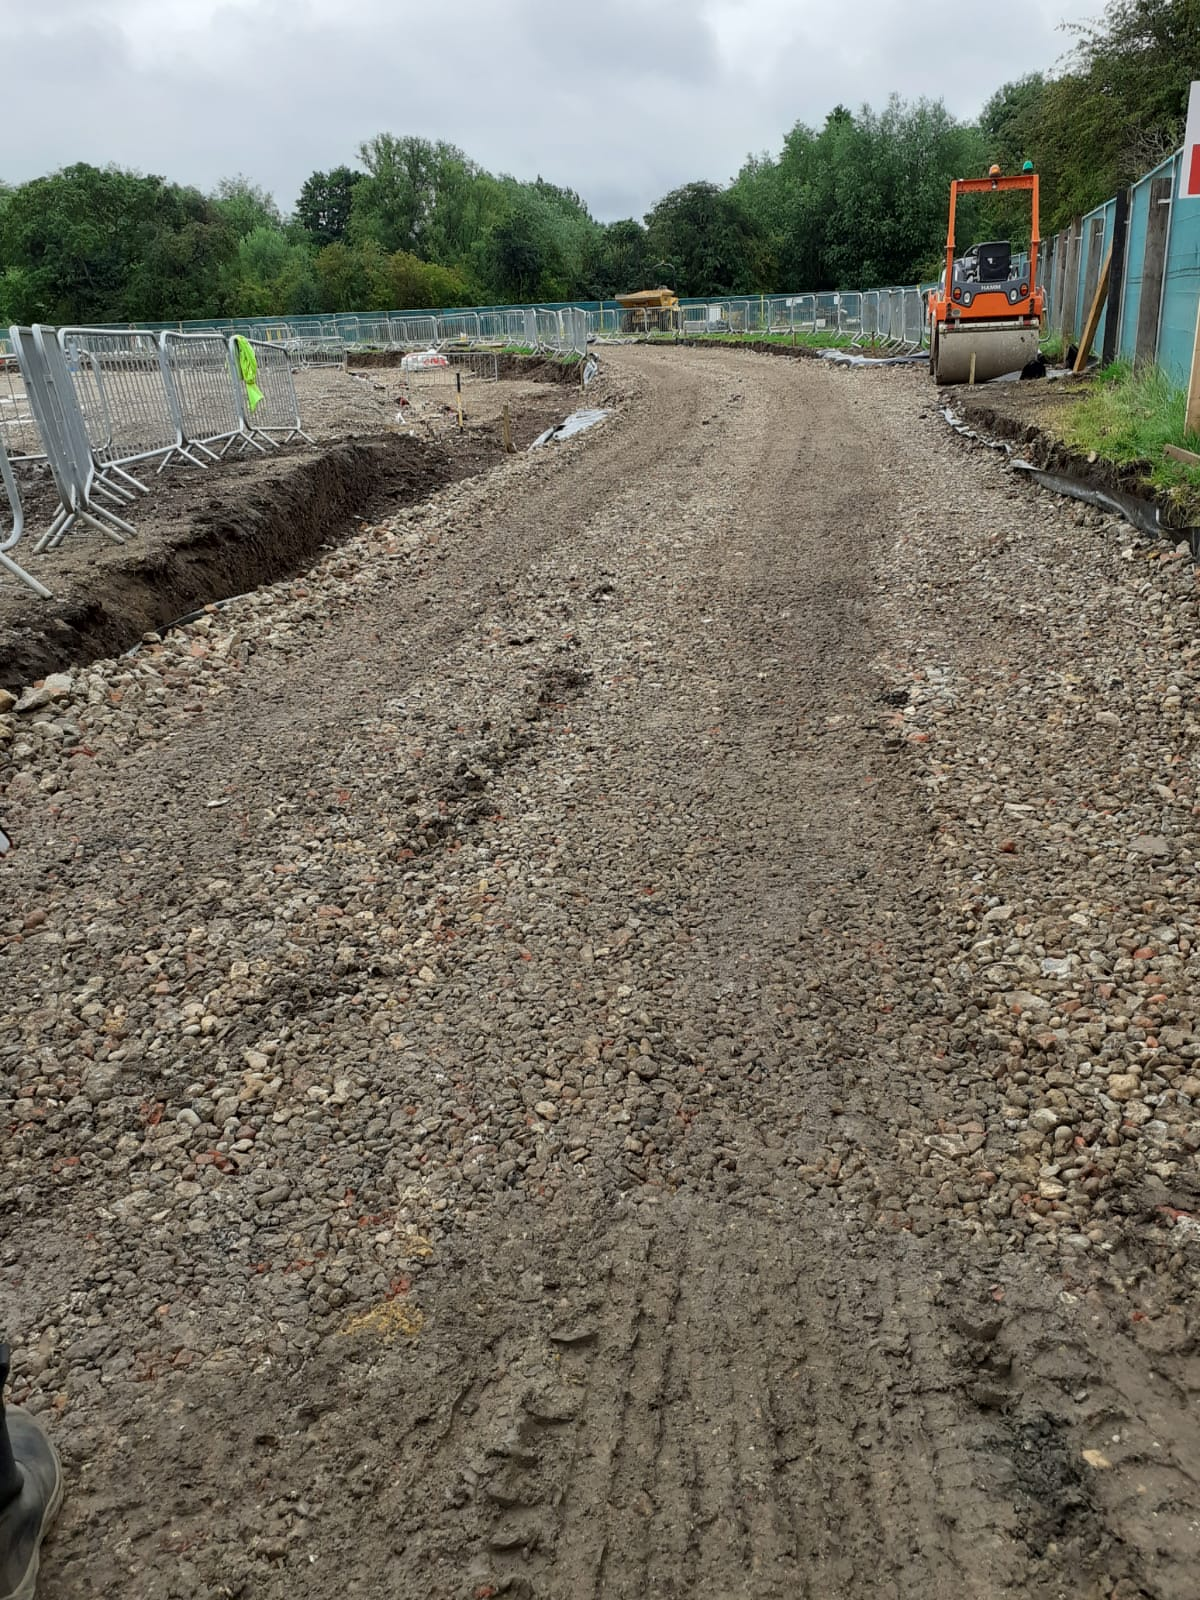 The haul road at Grange Paddocks for construction traffic